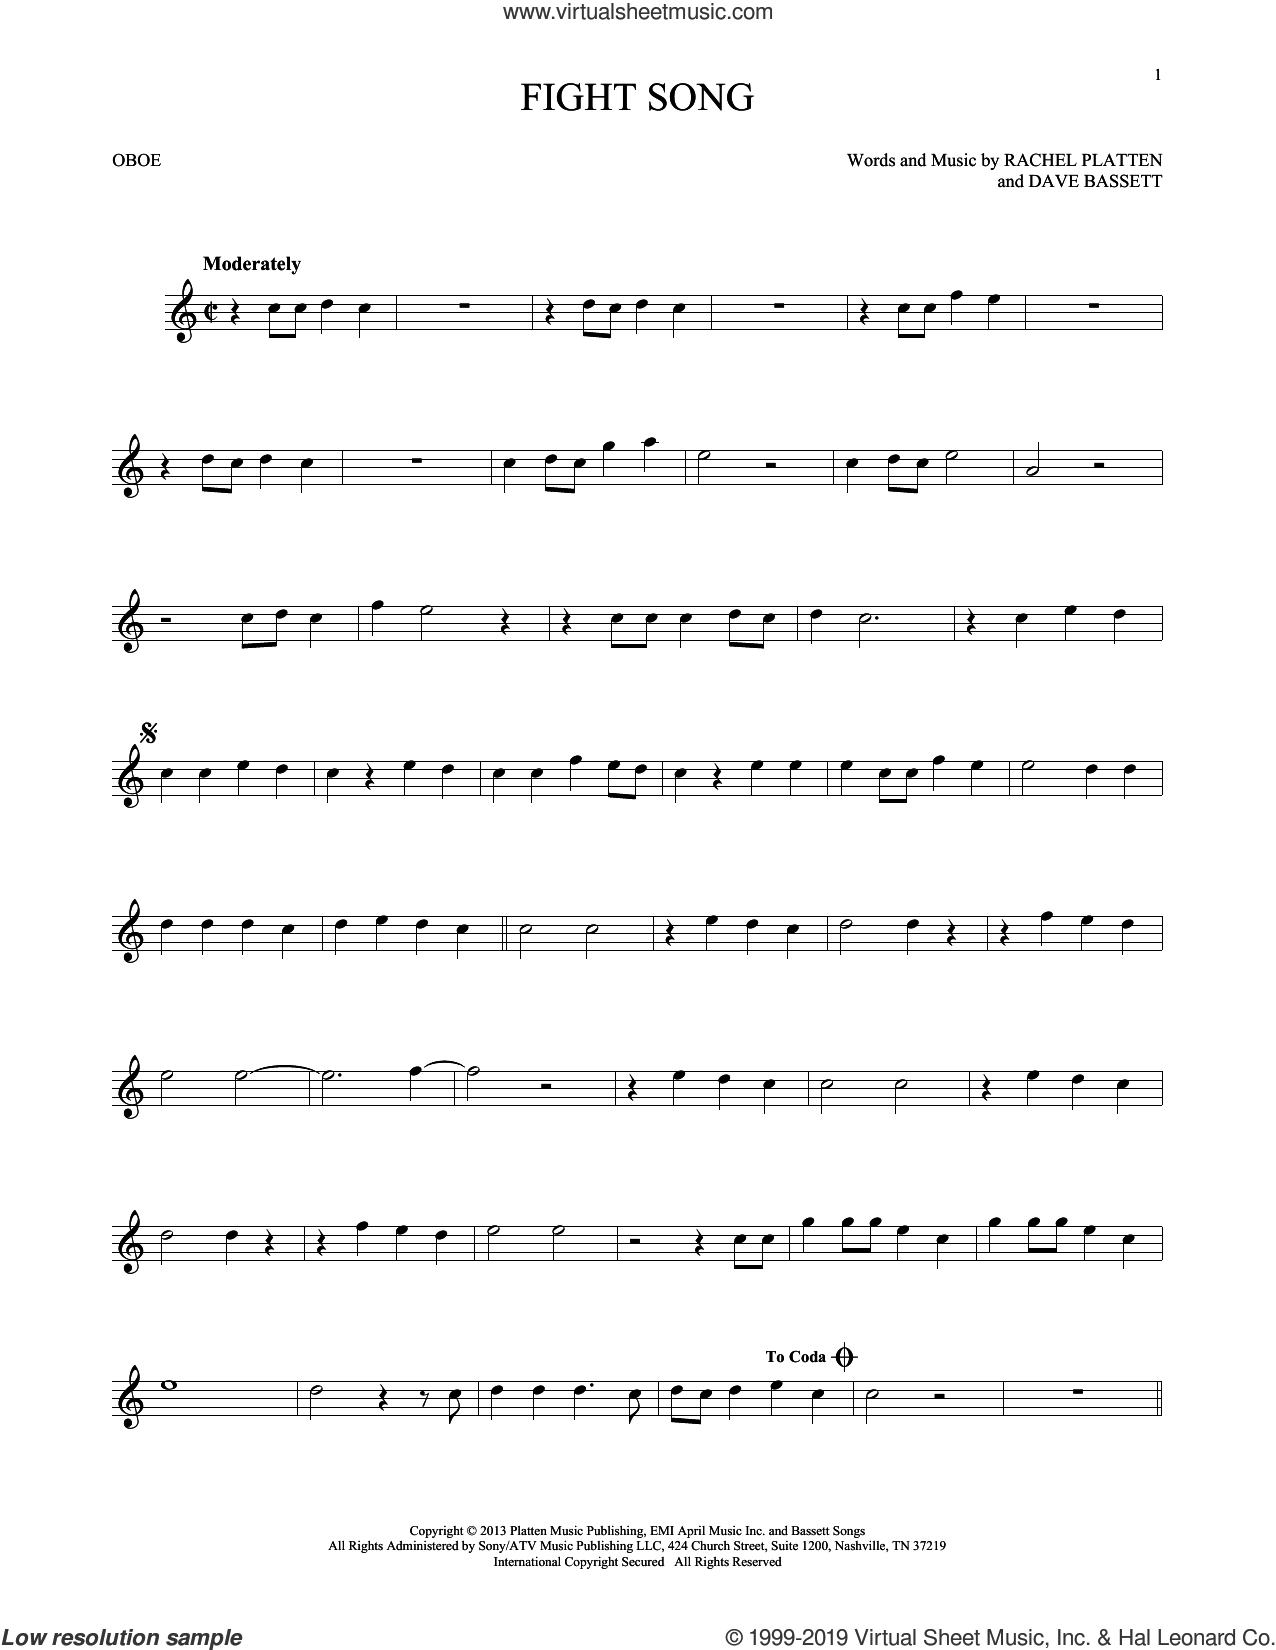 Fight Song sheet music for oboe solo by Rachel Platten and Dave Bassett, intermediate skill level